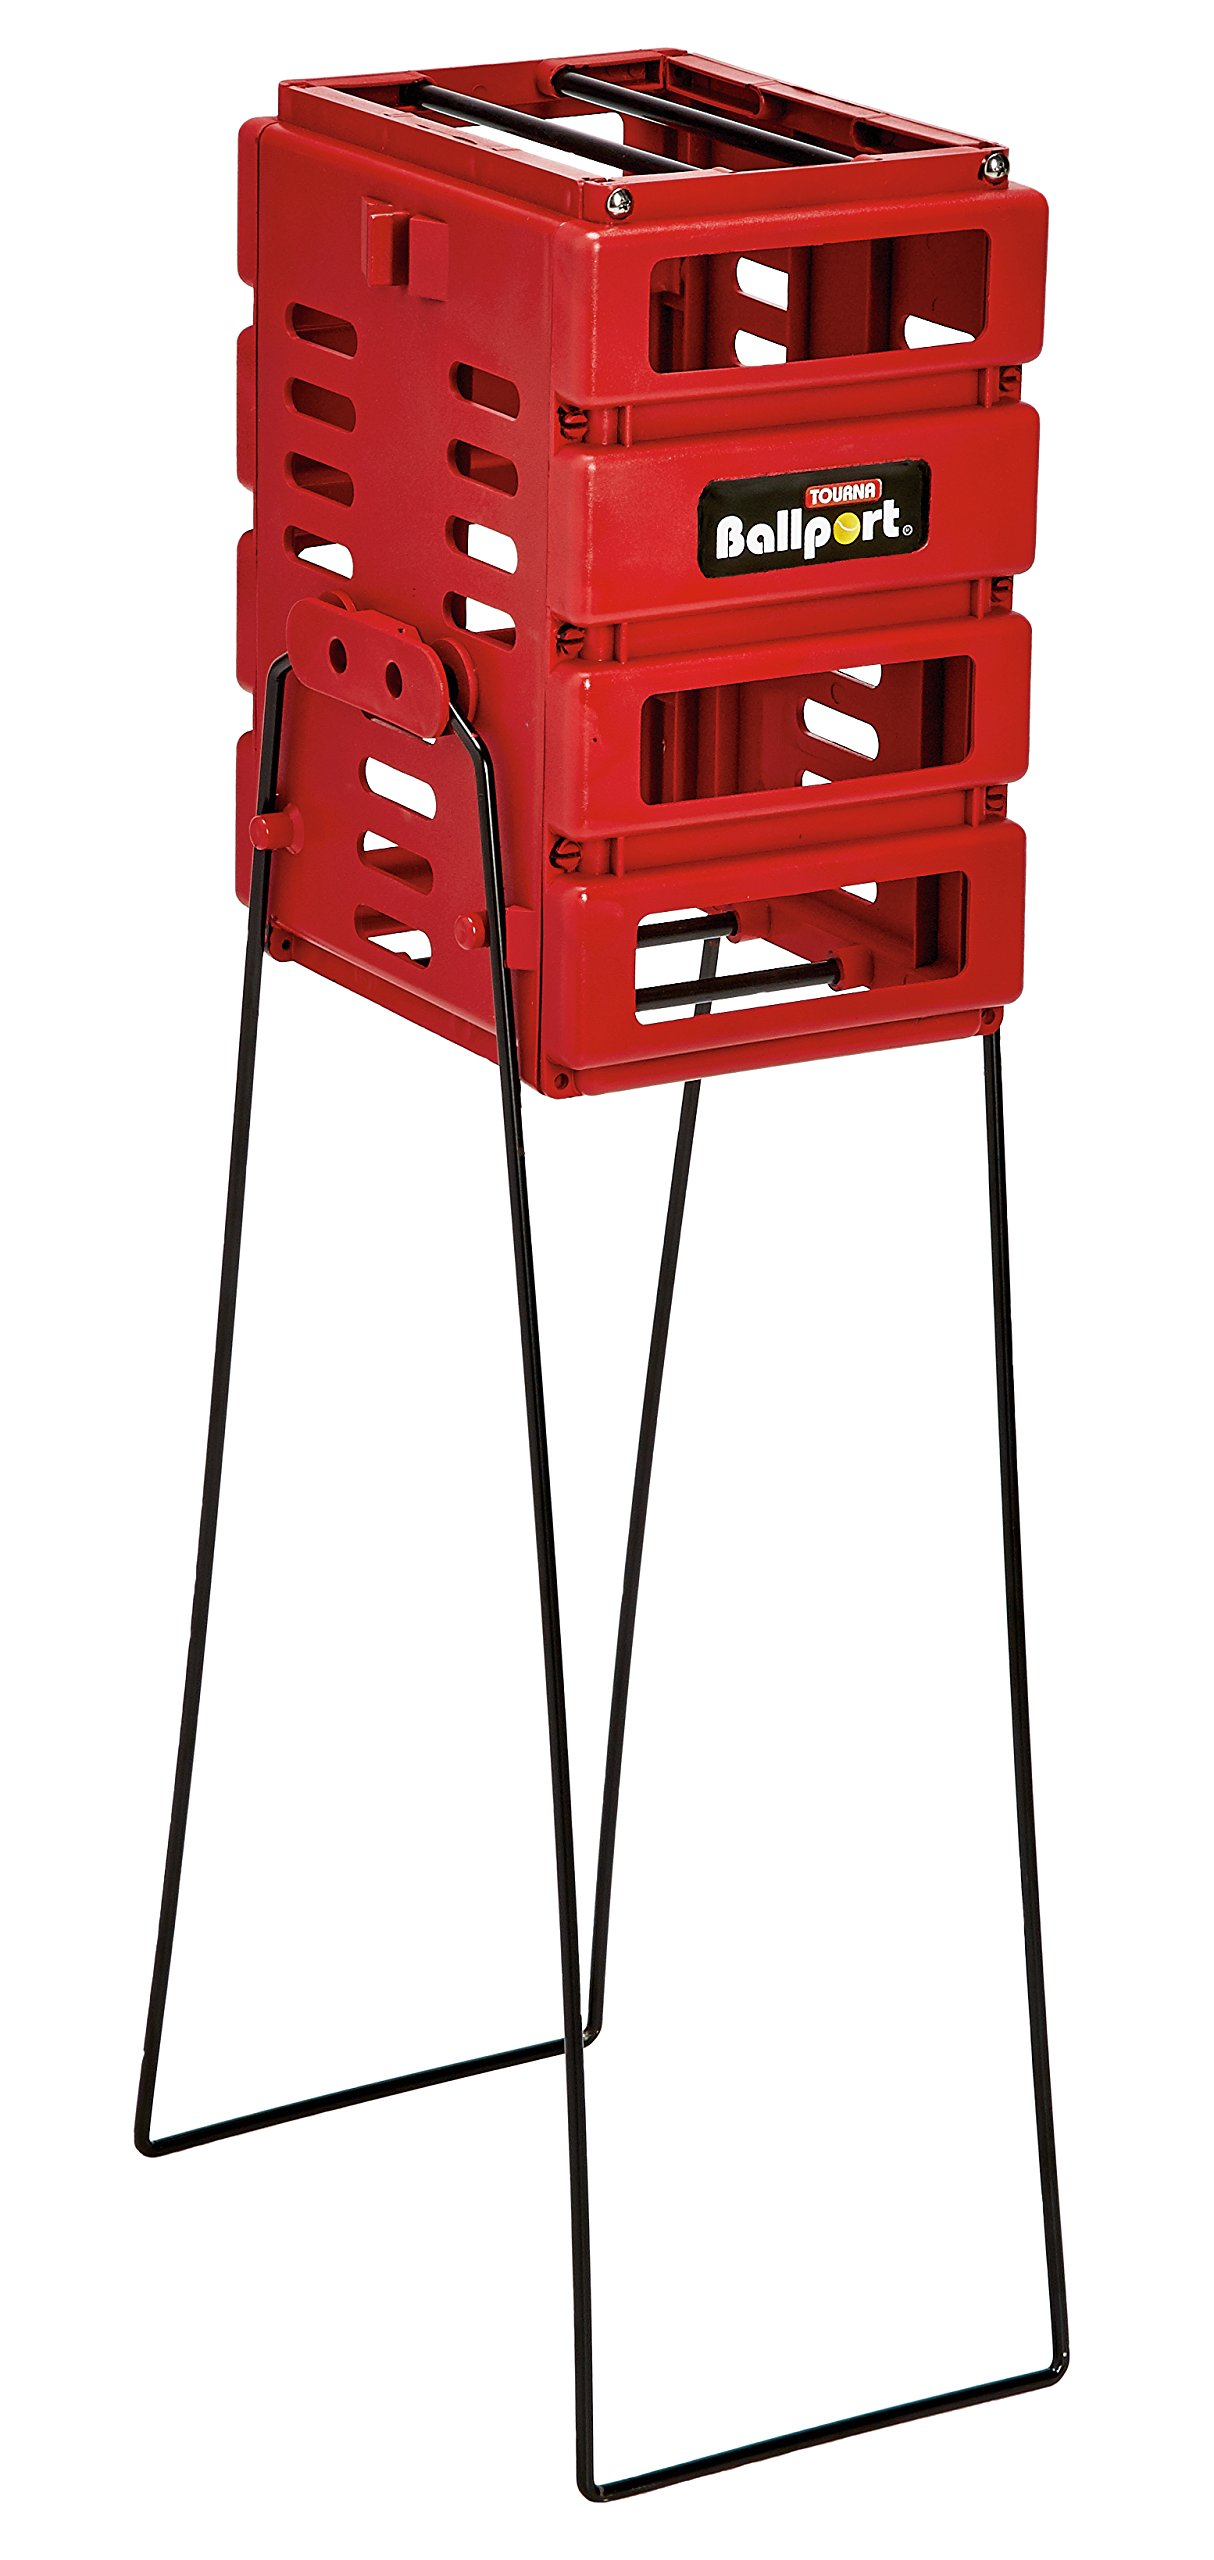 TOURNA Red Pete Sampras Mini Ballport, Holds 36 Balls